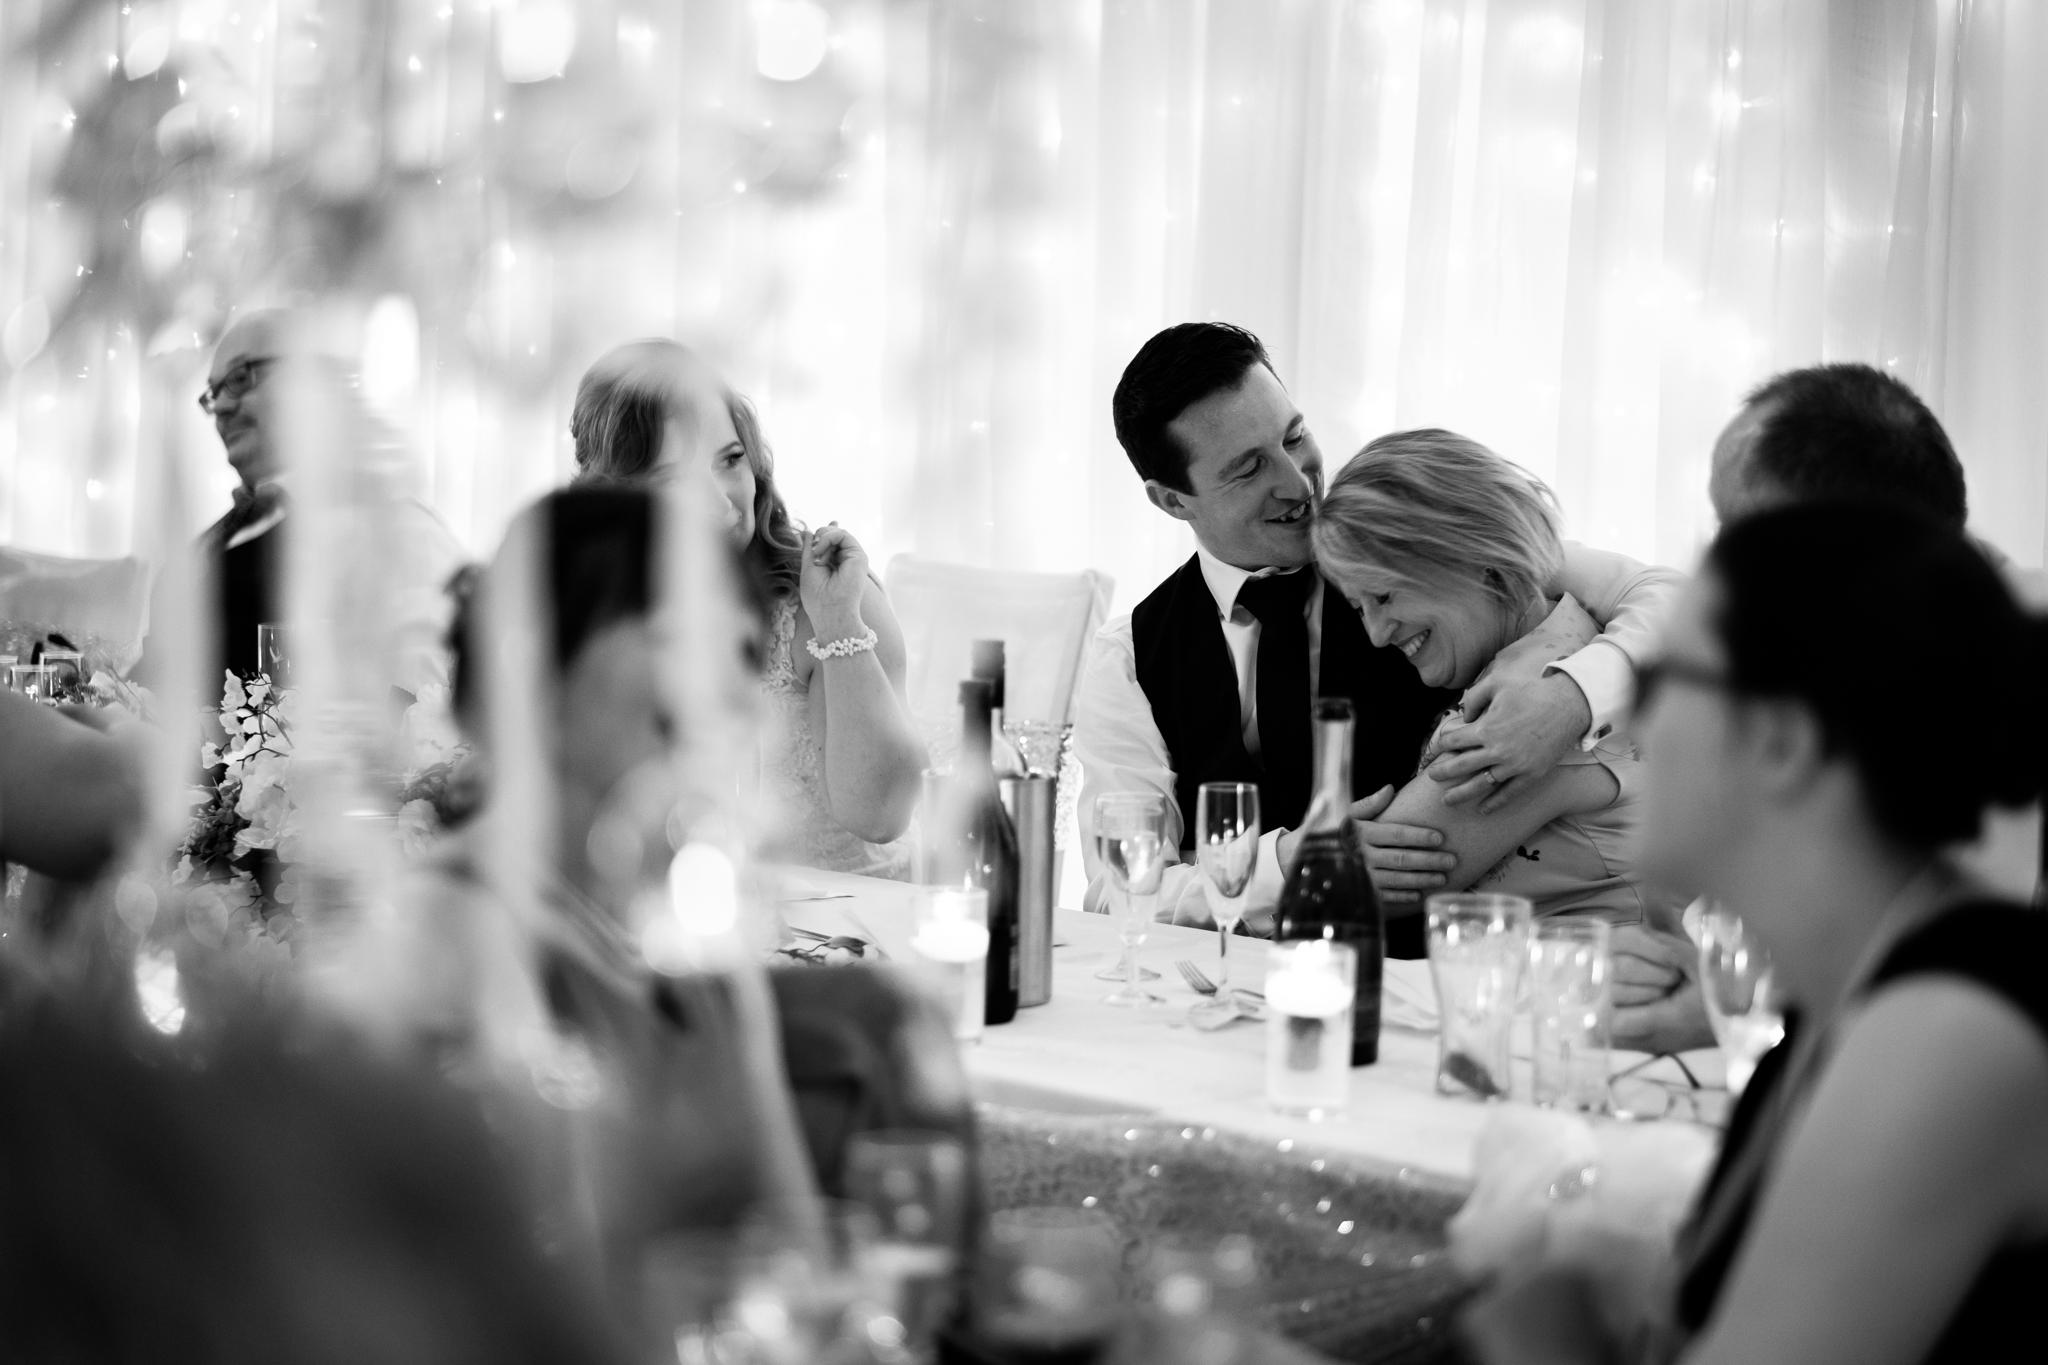 Mother son hug wedding day.jpg